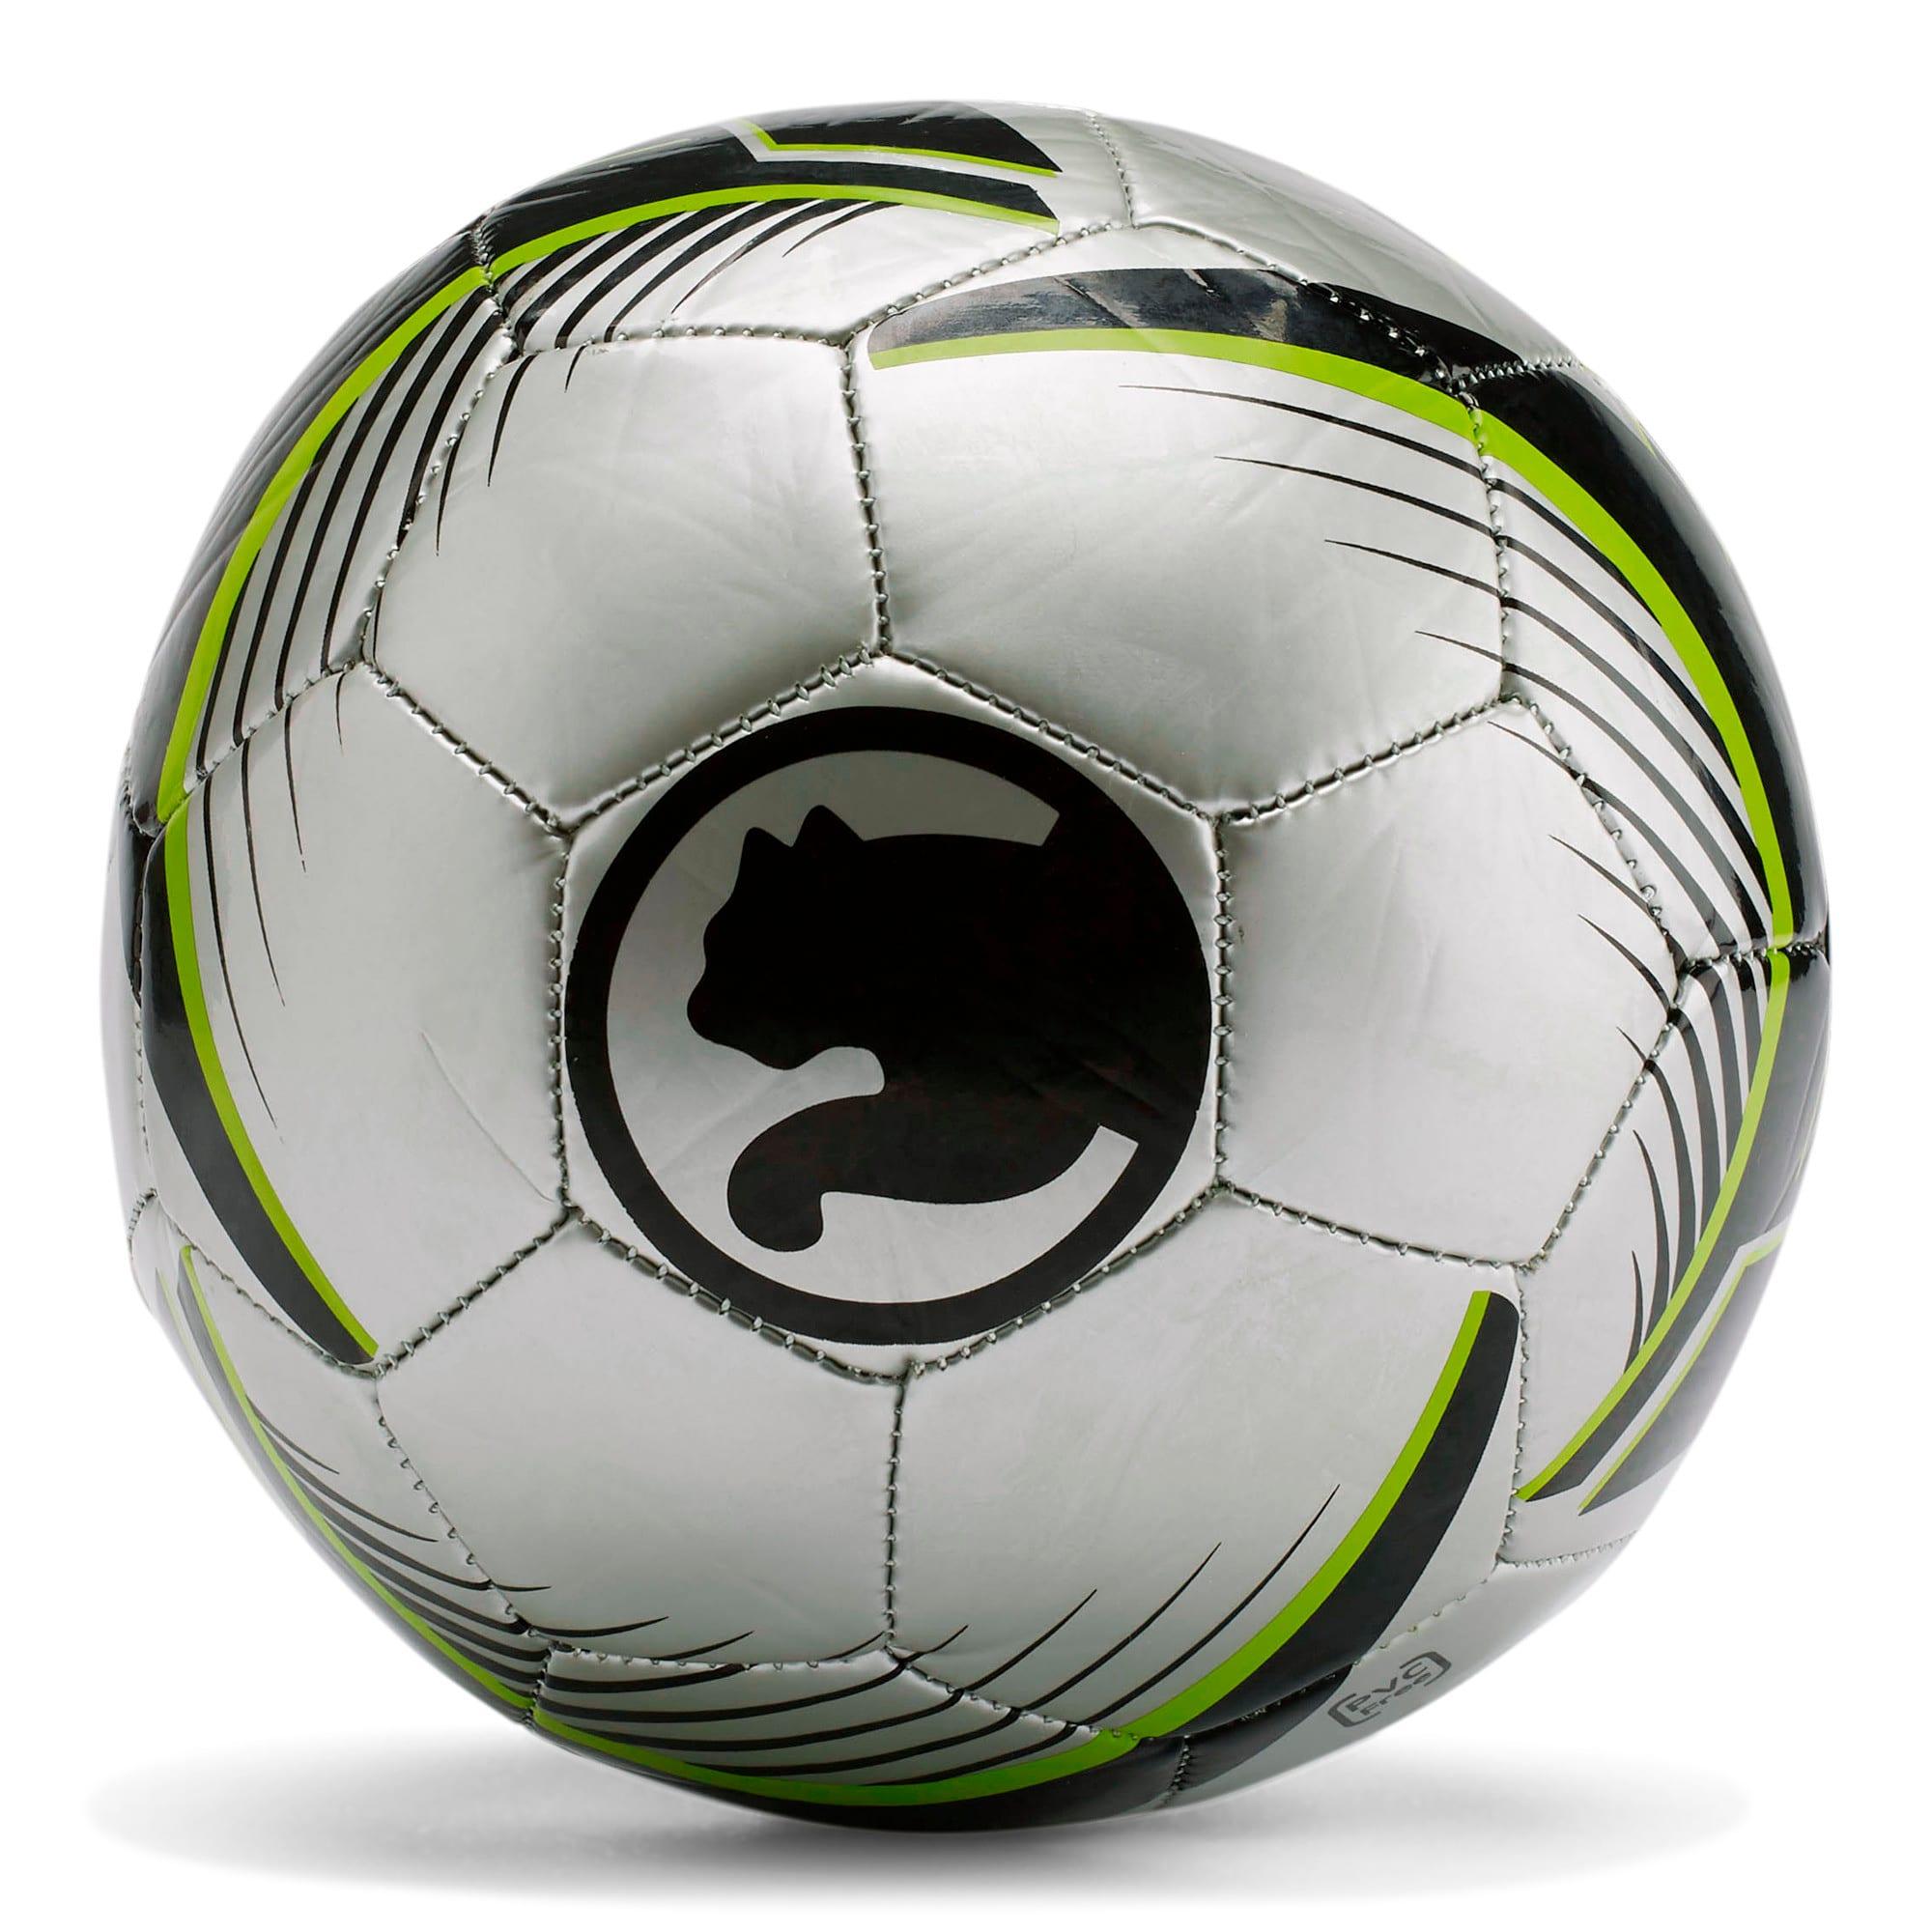 Thumbnail 1 of ProCat Offside Soccer Ball, SILVER, medium